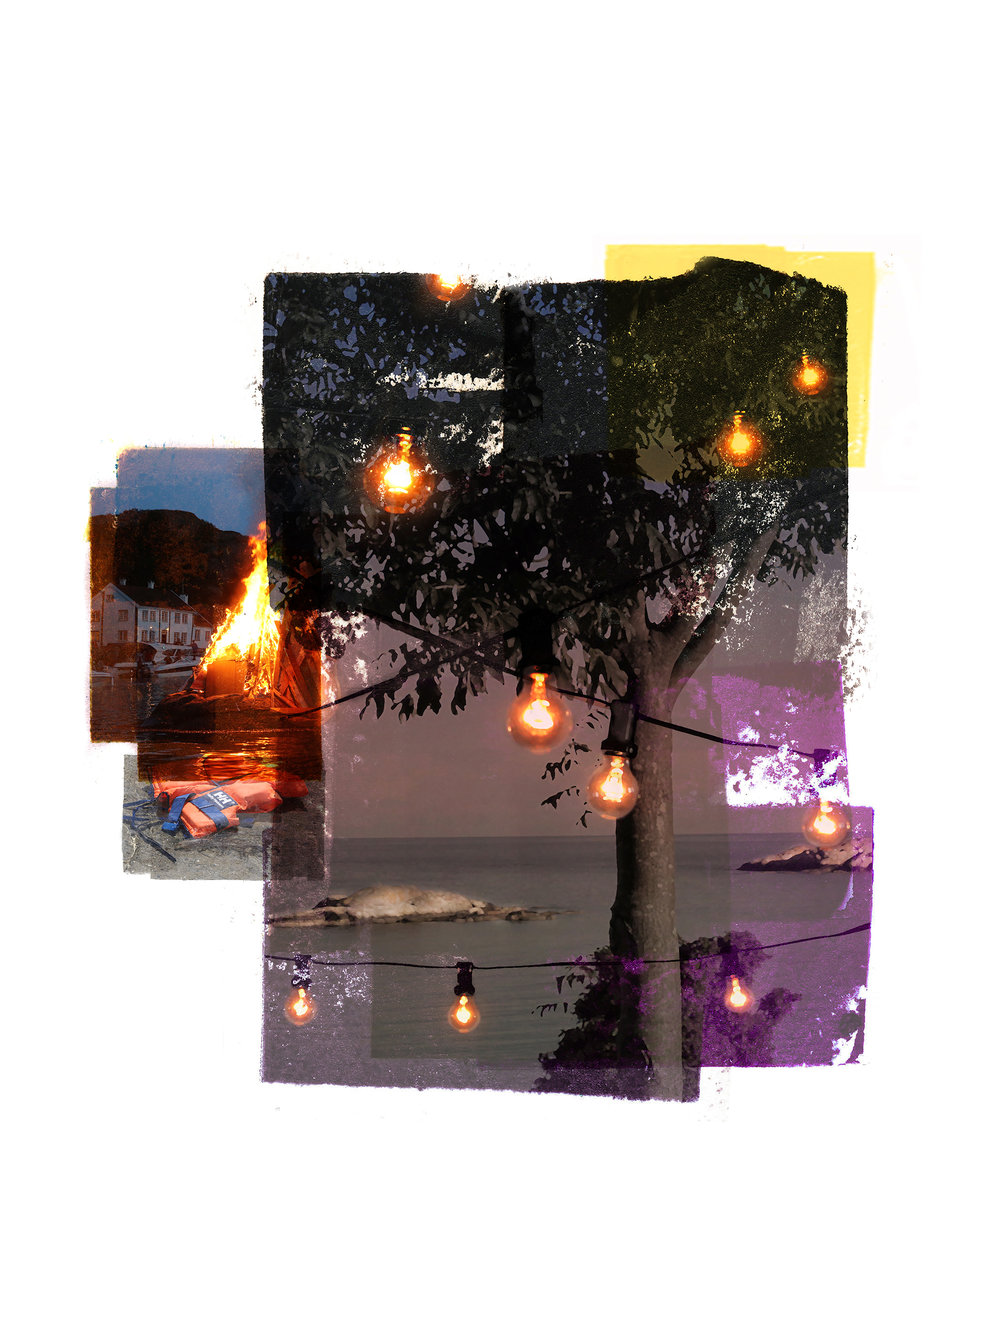 Rim of the party / Olsok / Edge of the party  Original Archival UV Pigment Print / BFK Rives 250 gr 22 x 20 cm / 8,6 x 7,8 in Edition of 15 + 3 Ap Editeur: Per Fronth Studios / Printer Henrik Aunevik  11/2016: